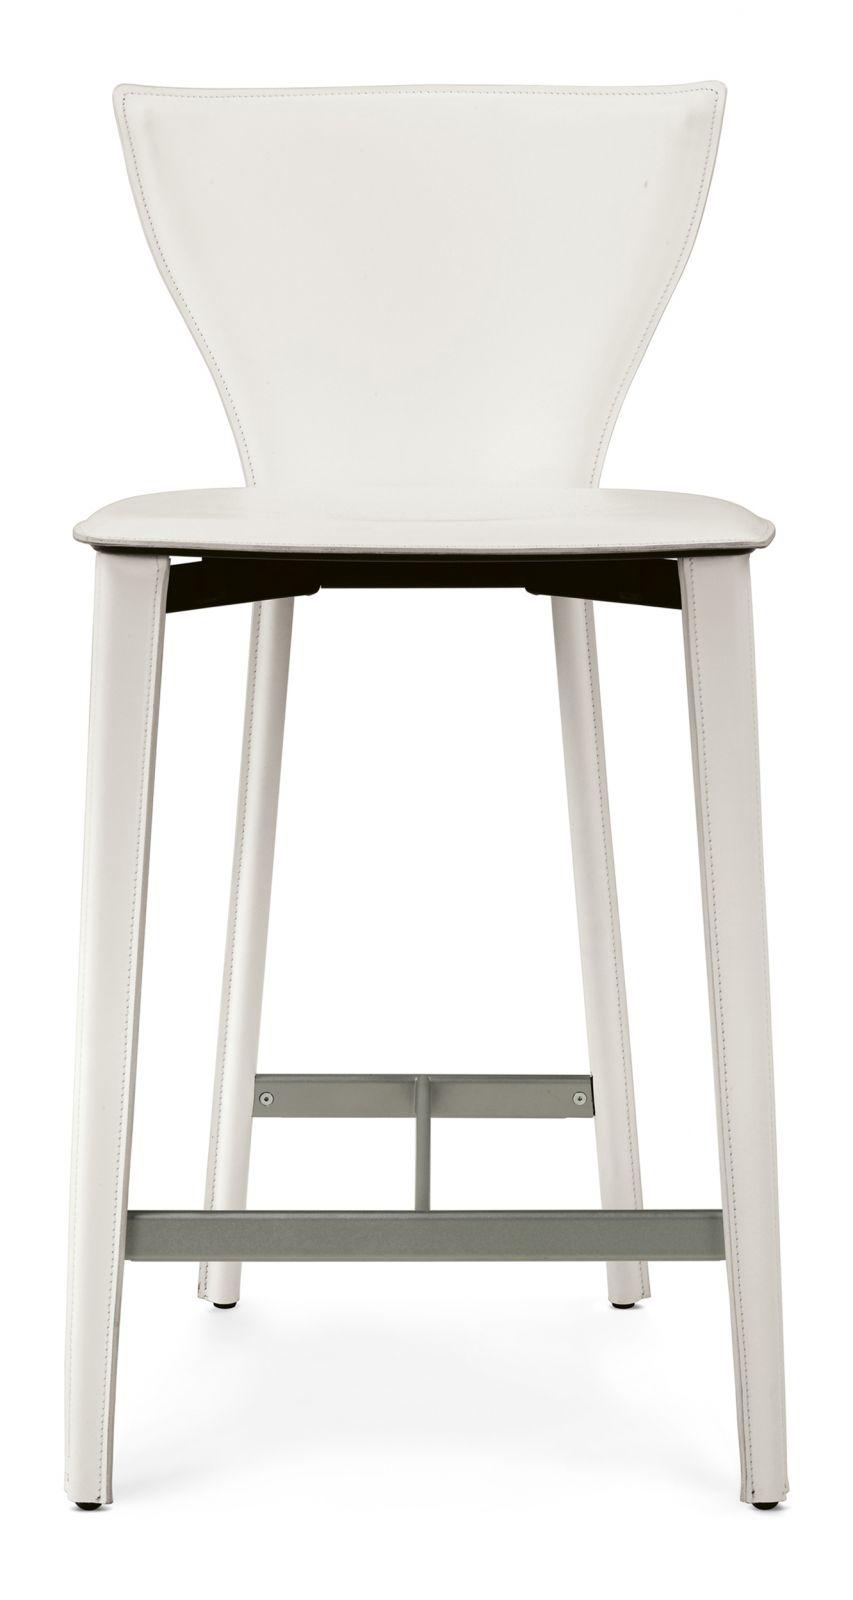 modern-bar-stools-Italian-furniture-large (31).jpg